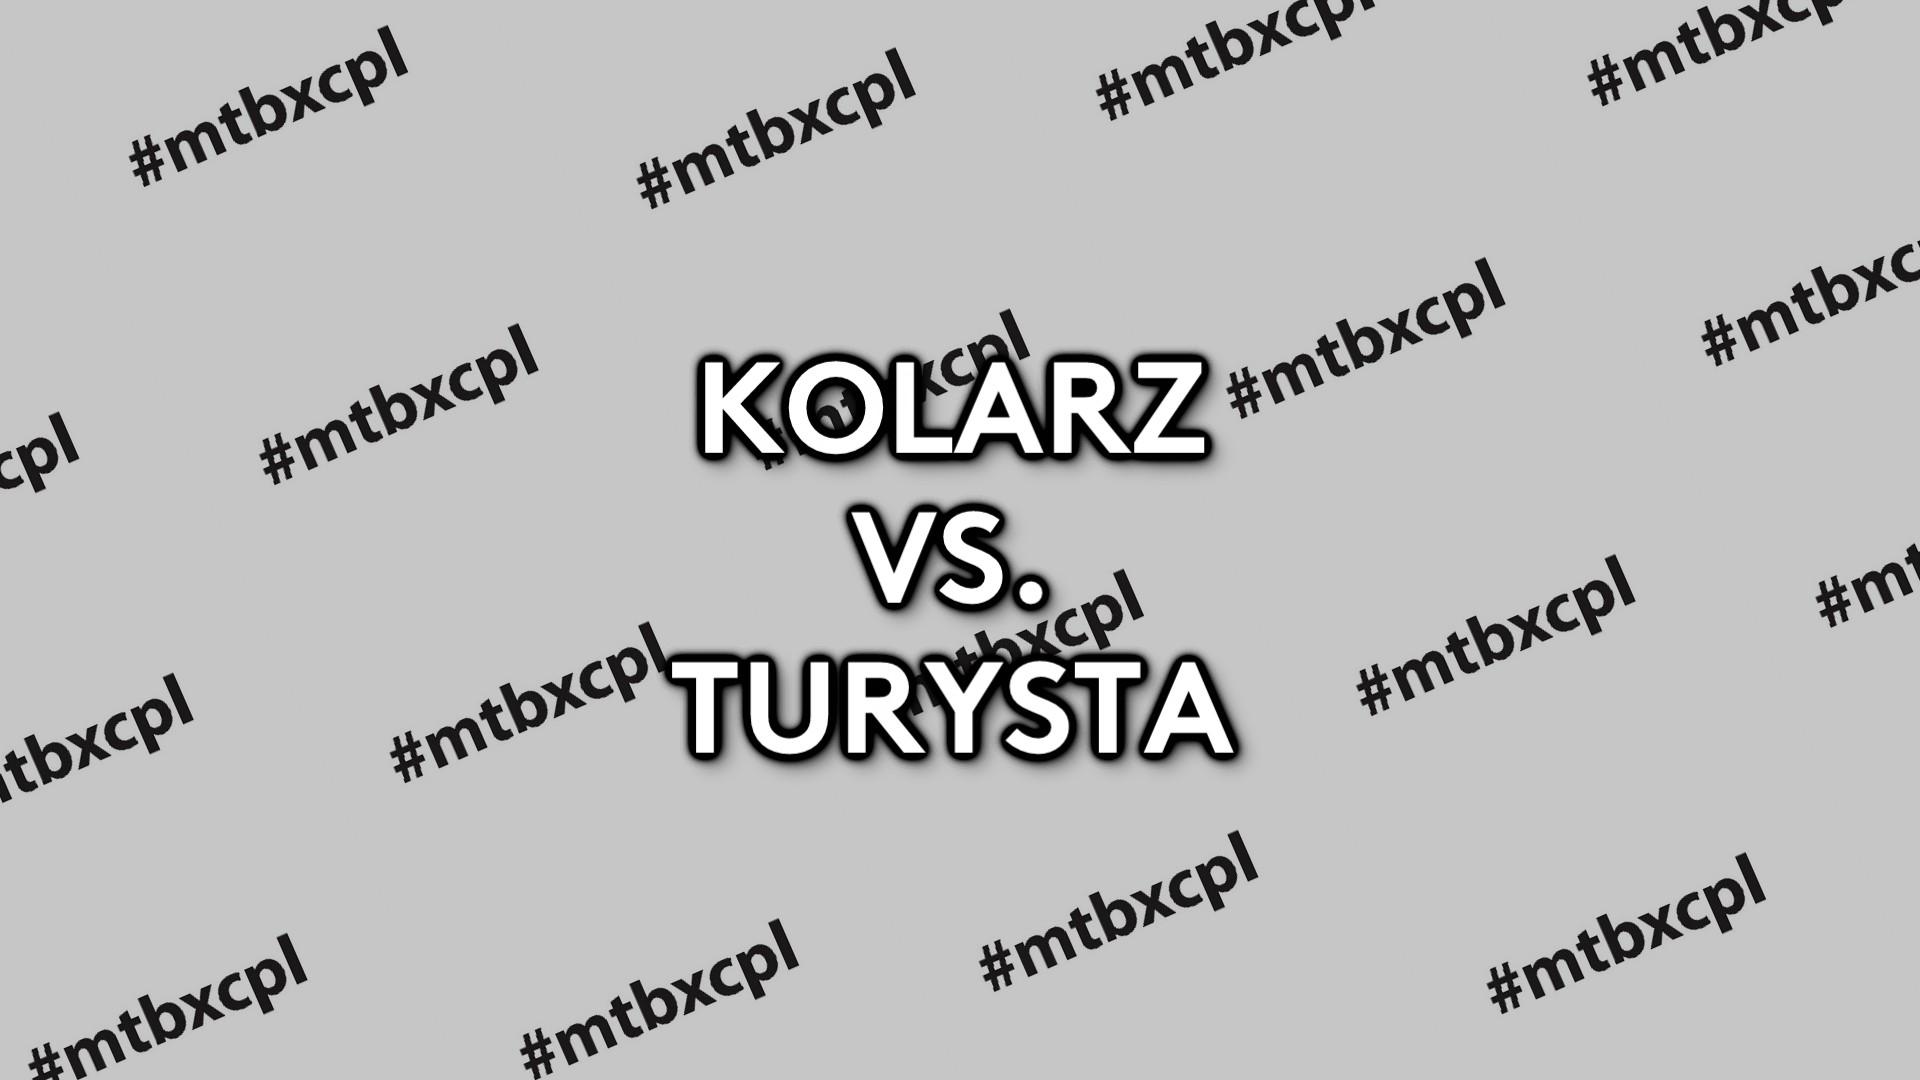 KOLARZ VS. TURYSTA